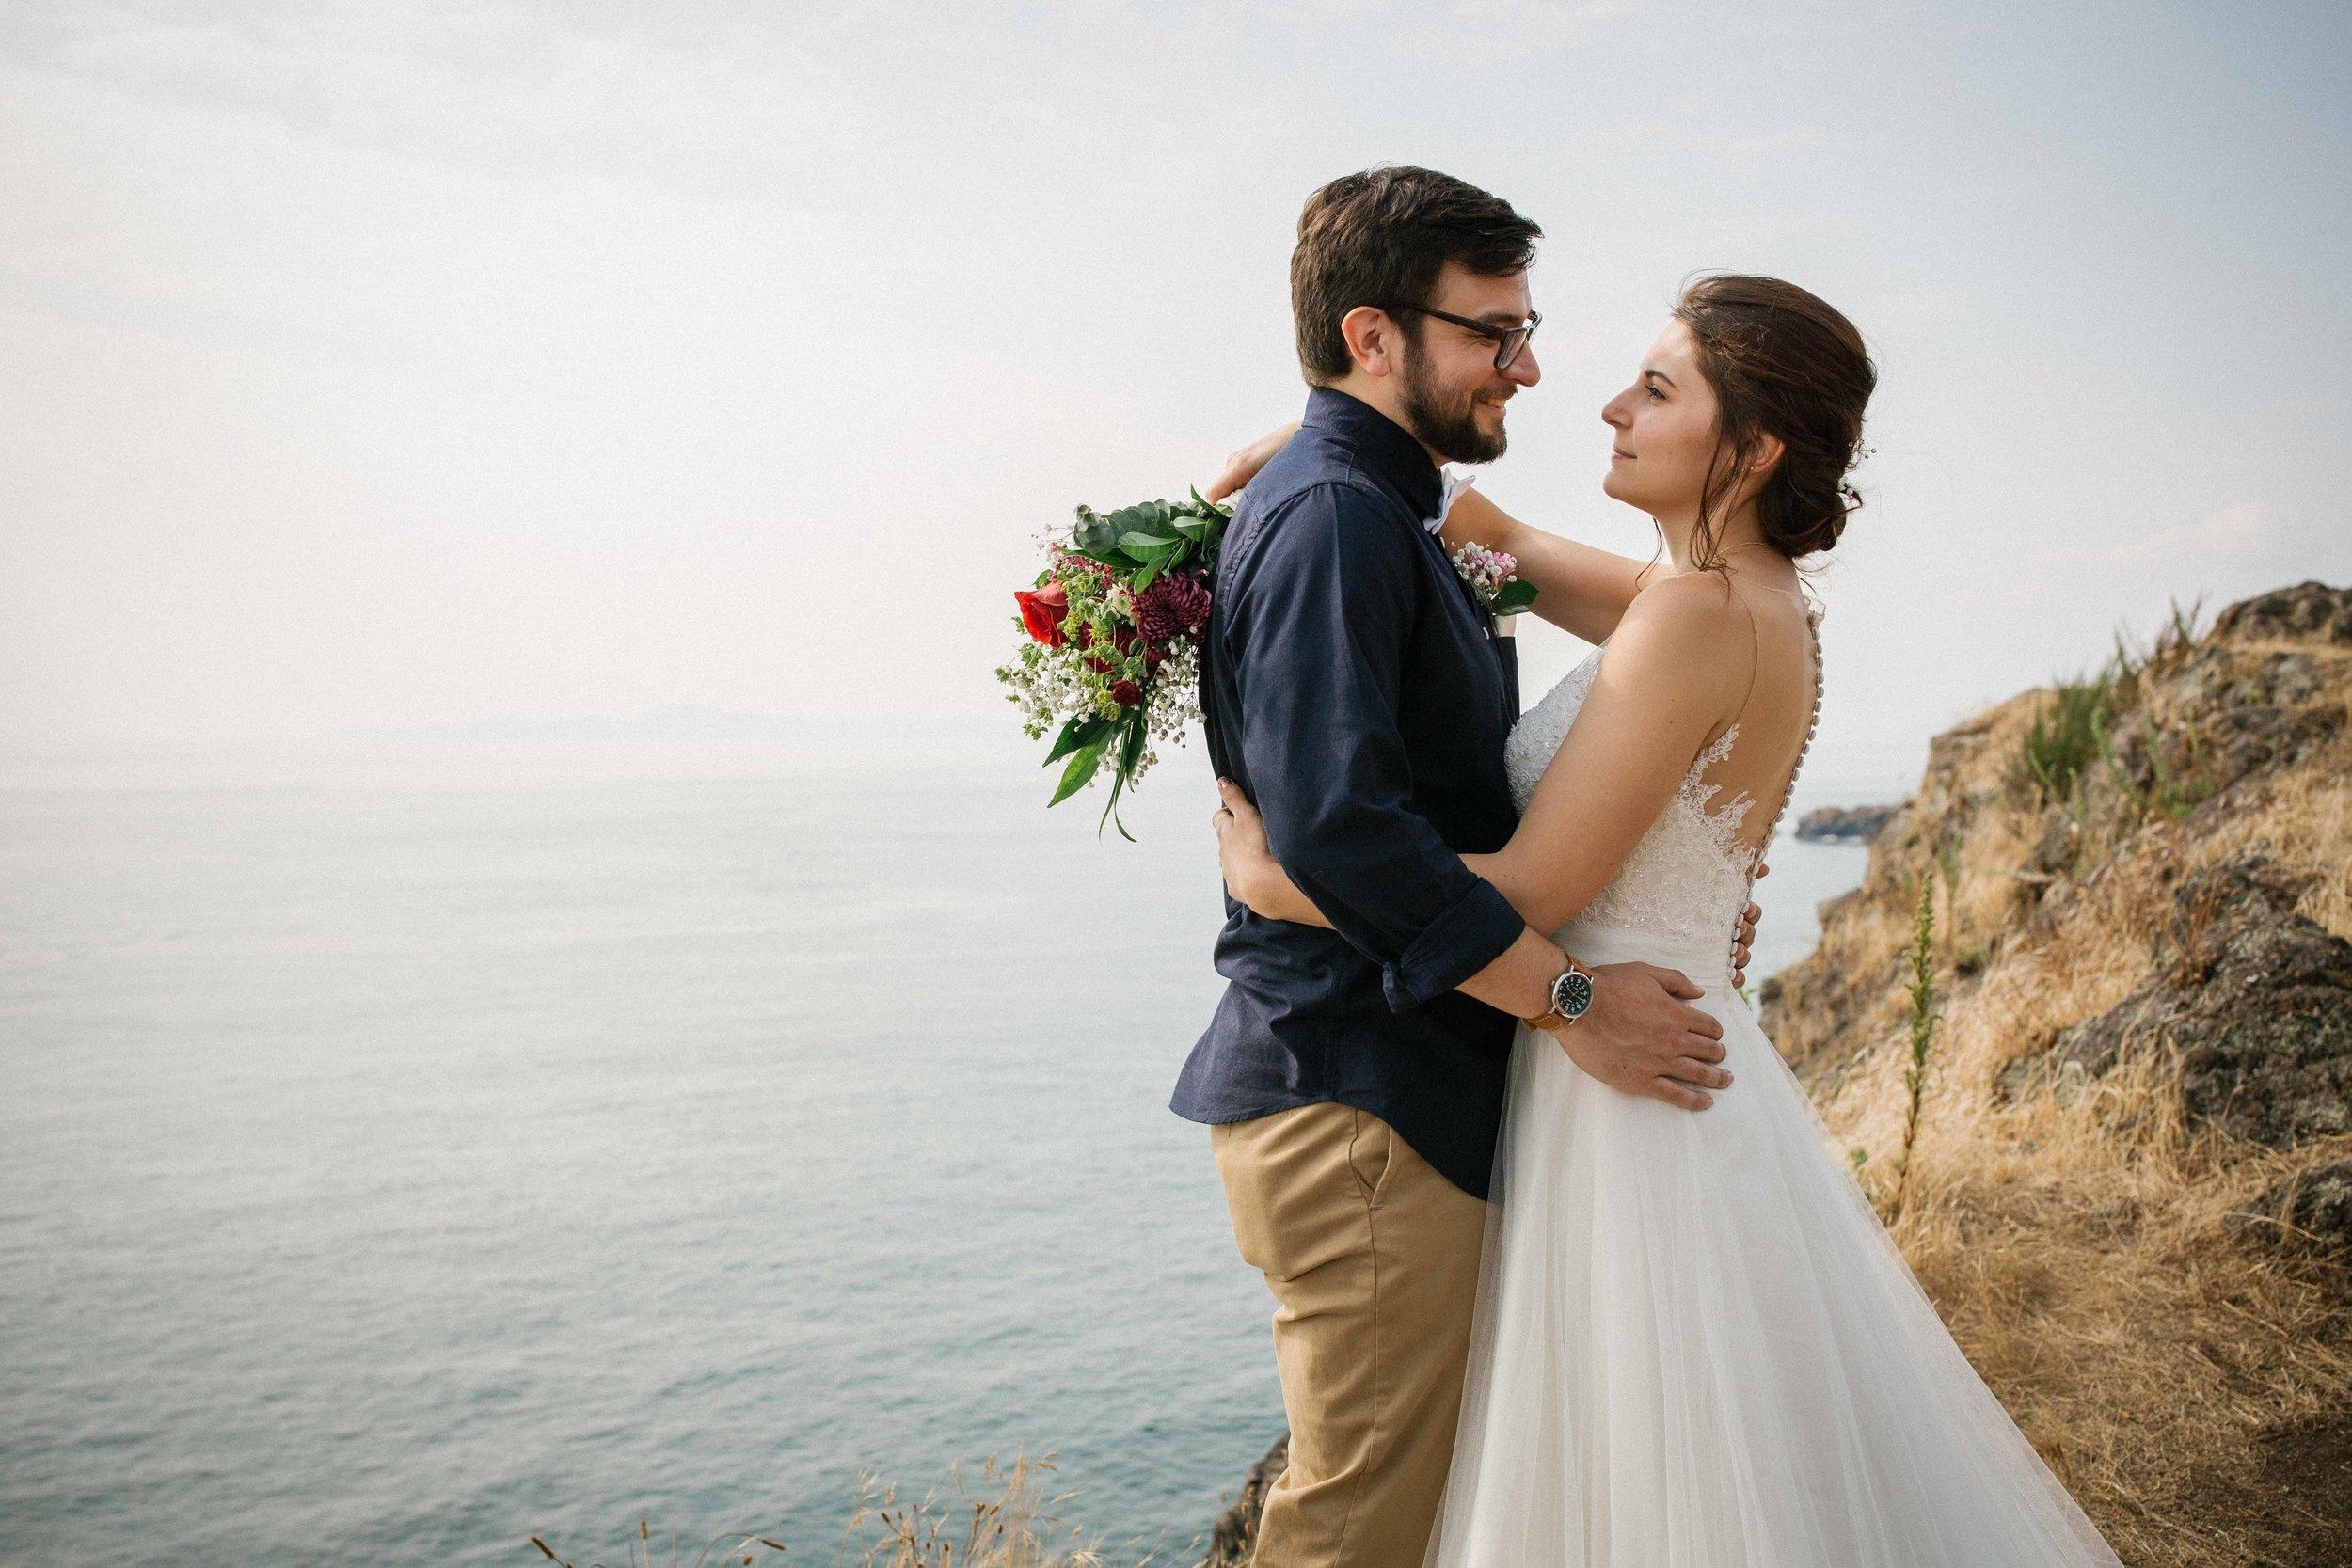 deception-pass-wedding-48.jpg